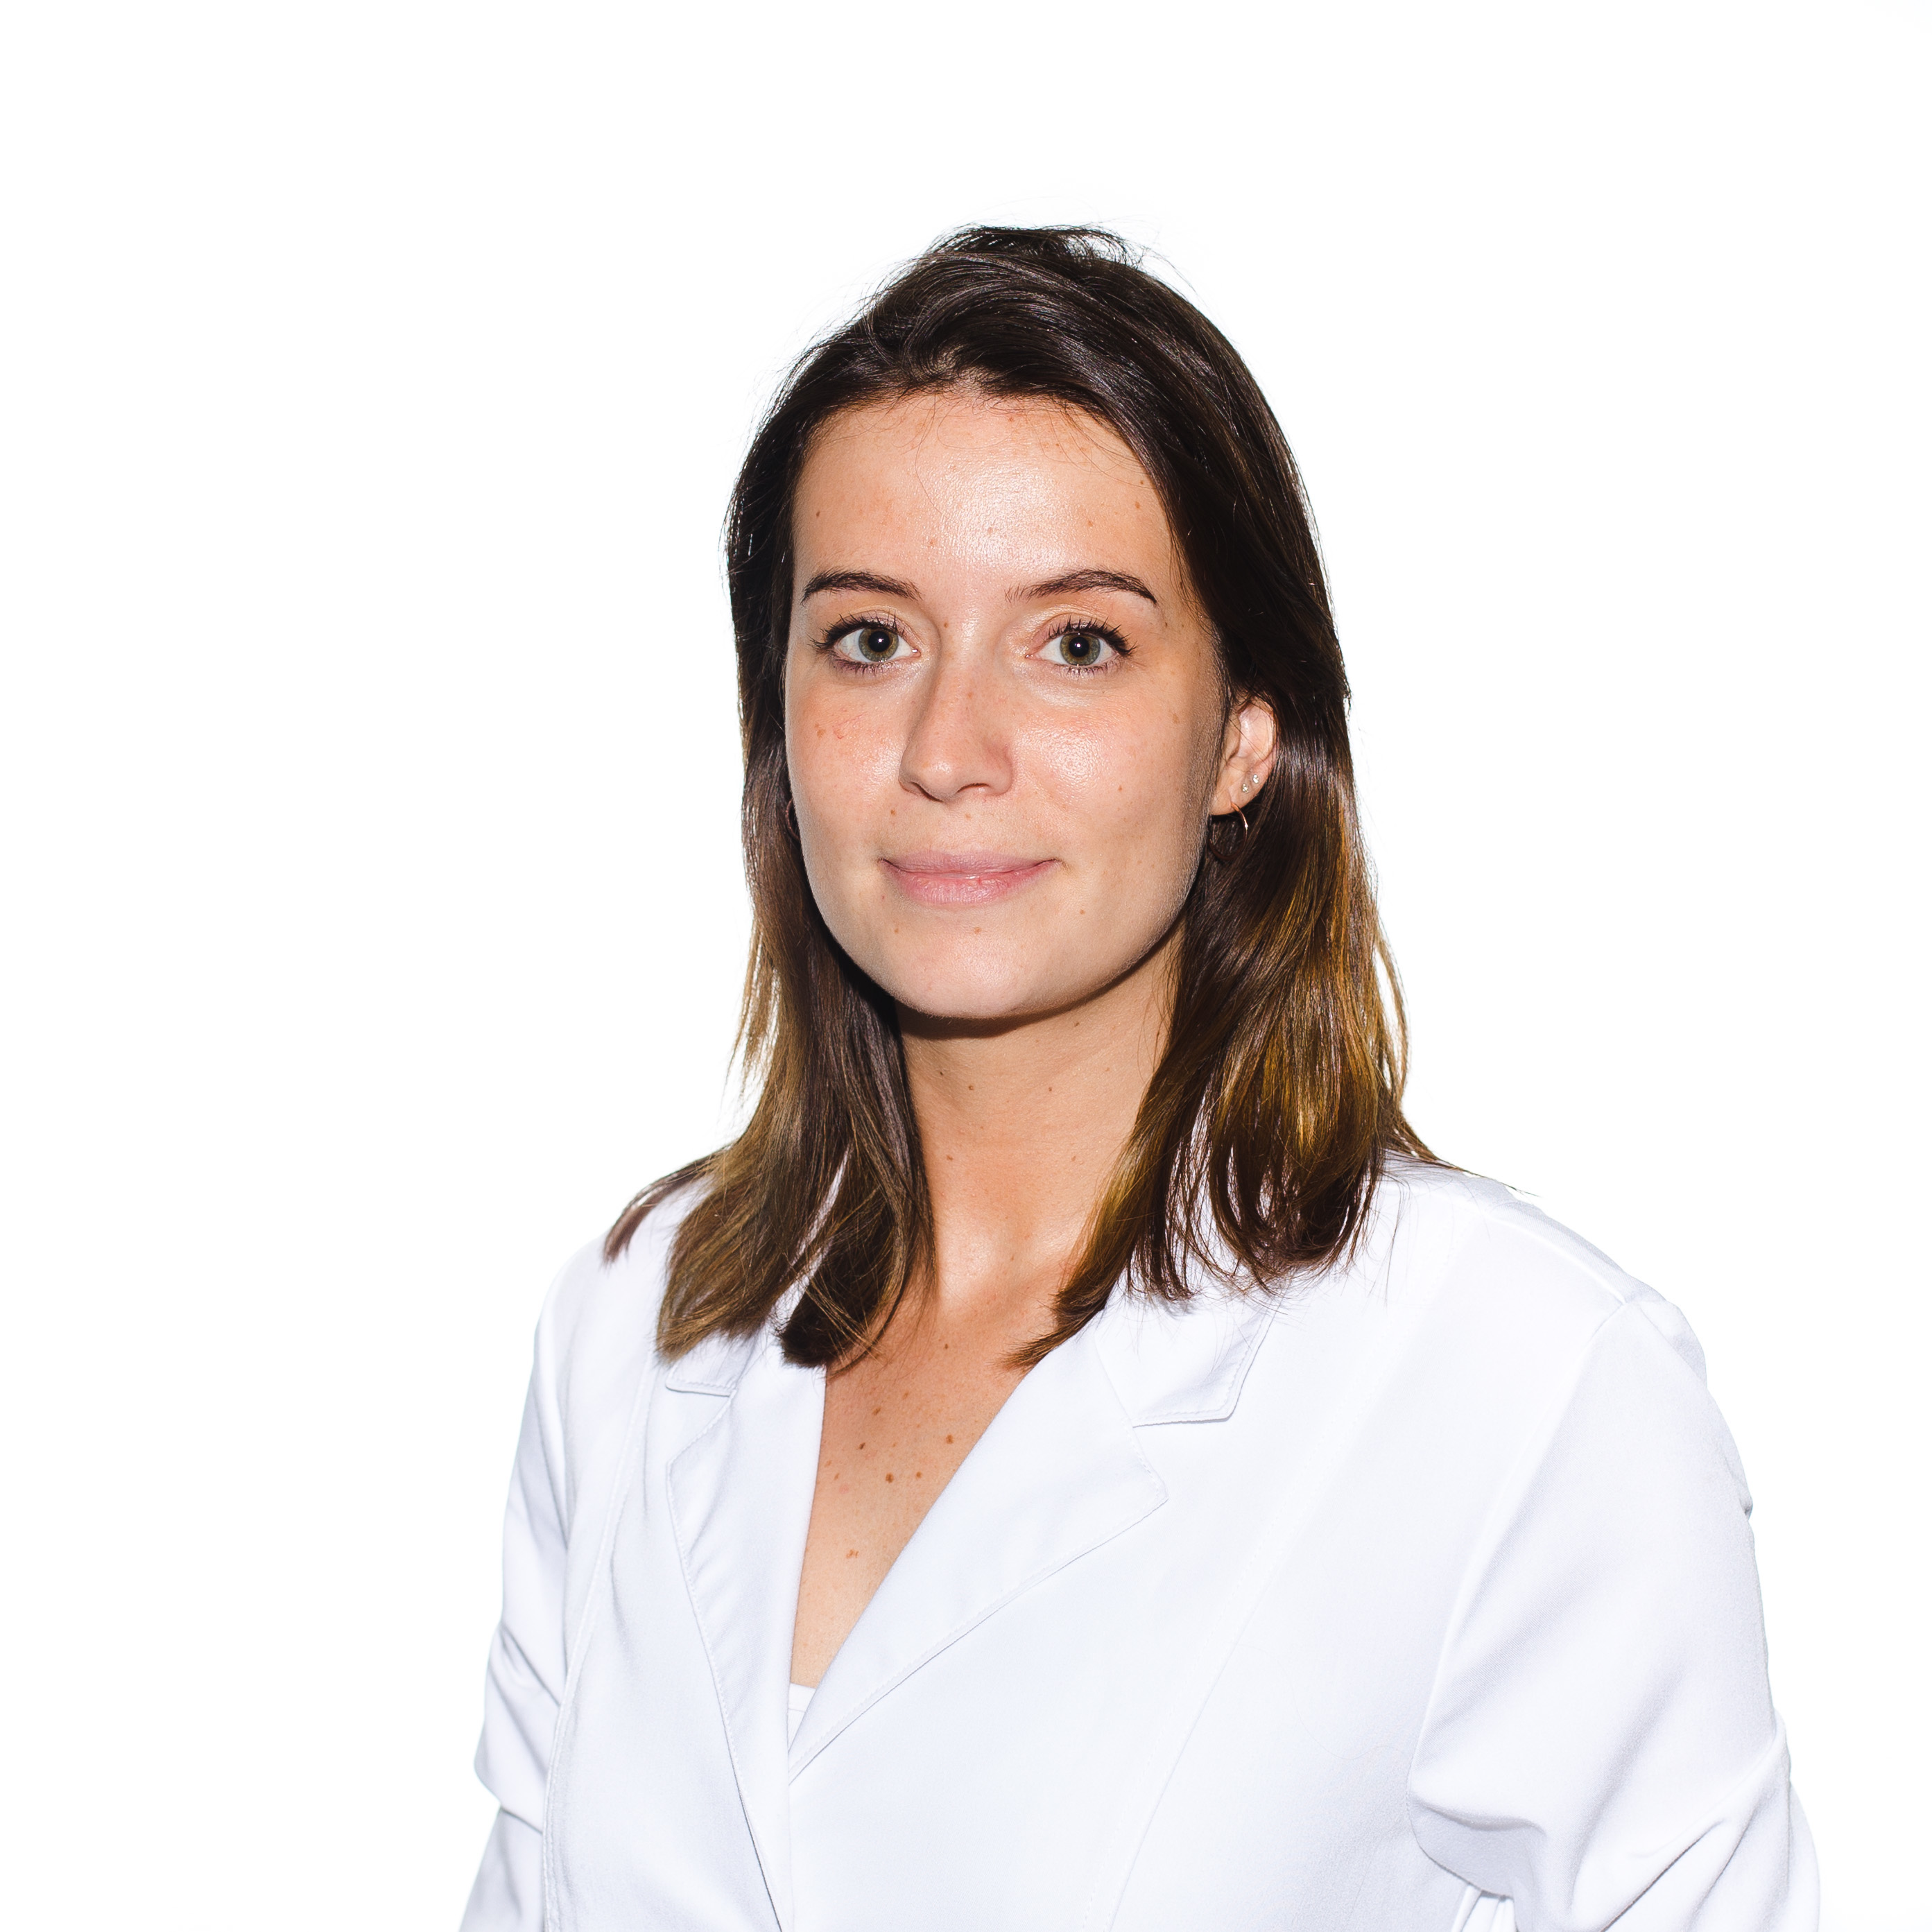 Dra. Carla Domínguez. Gynecology